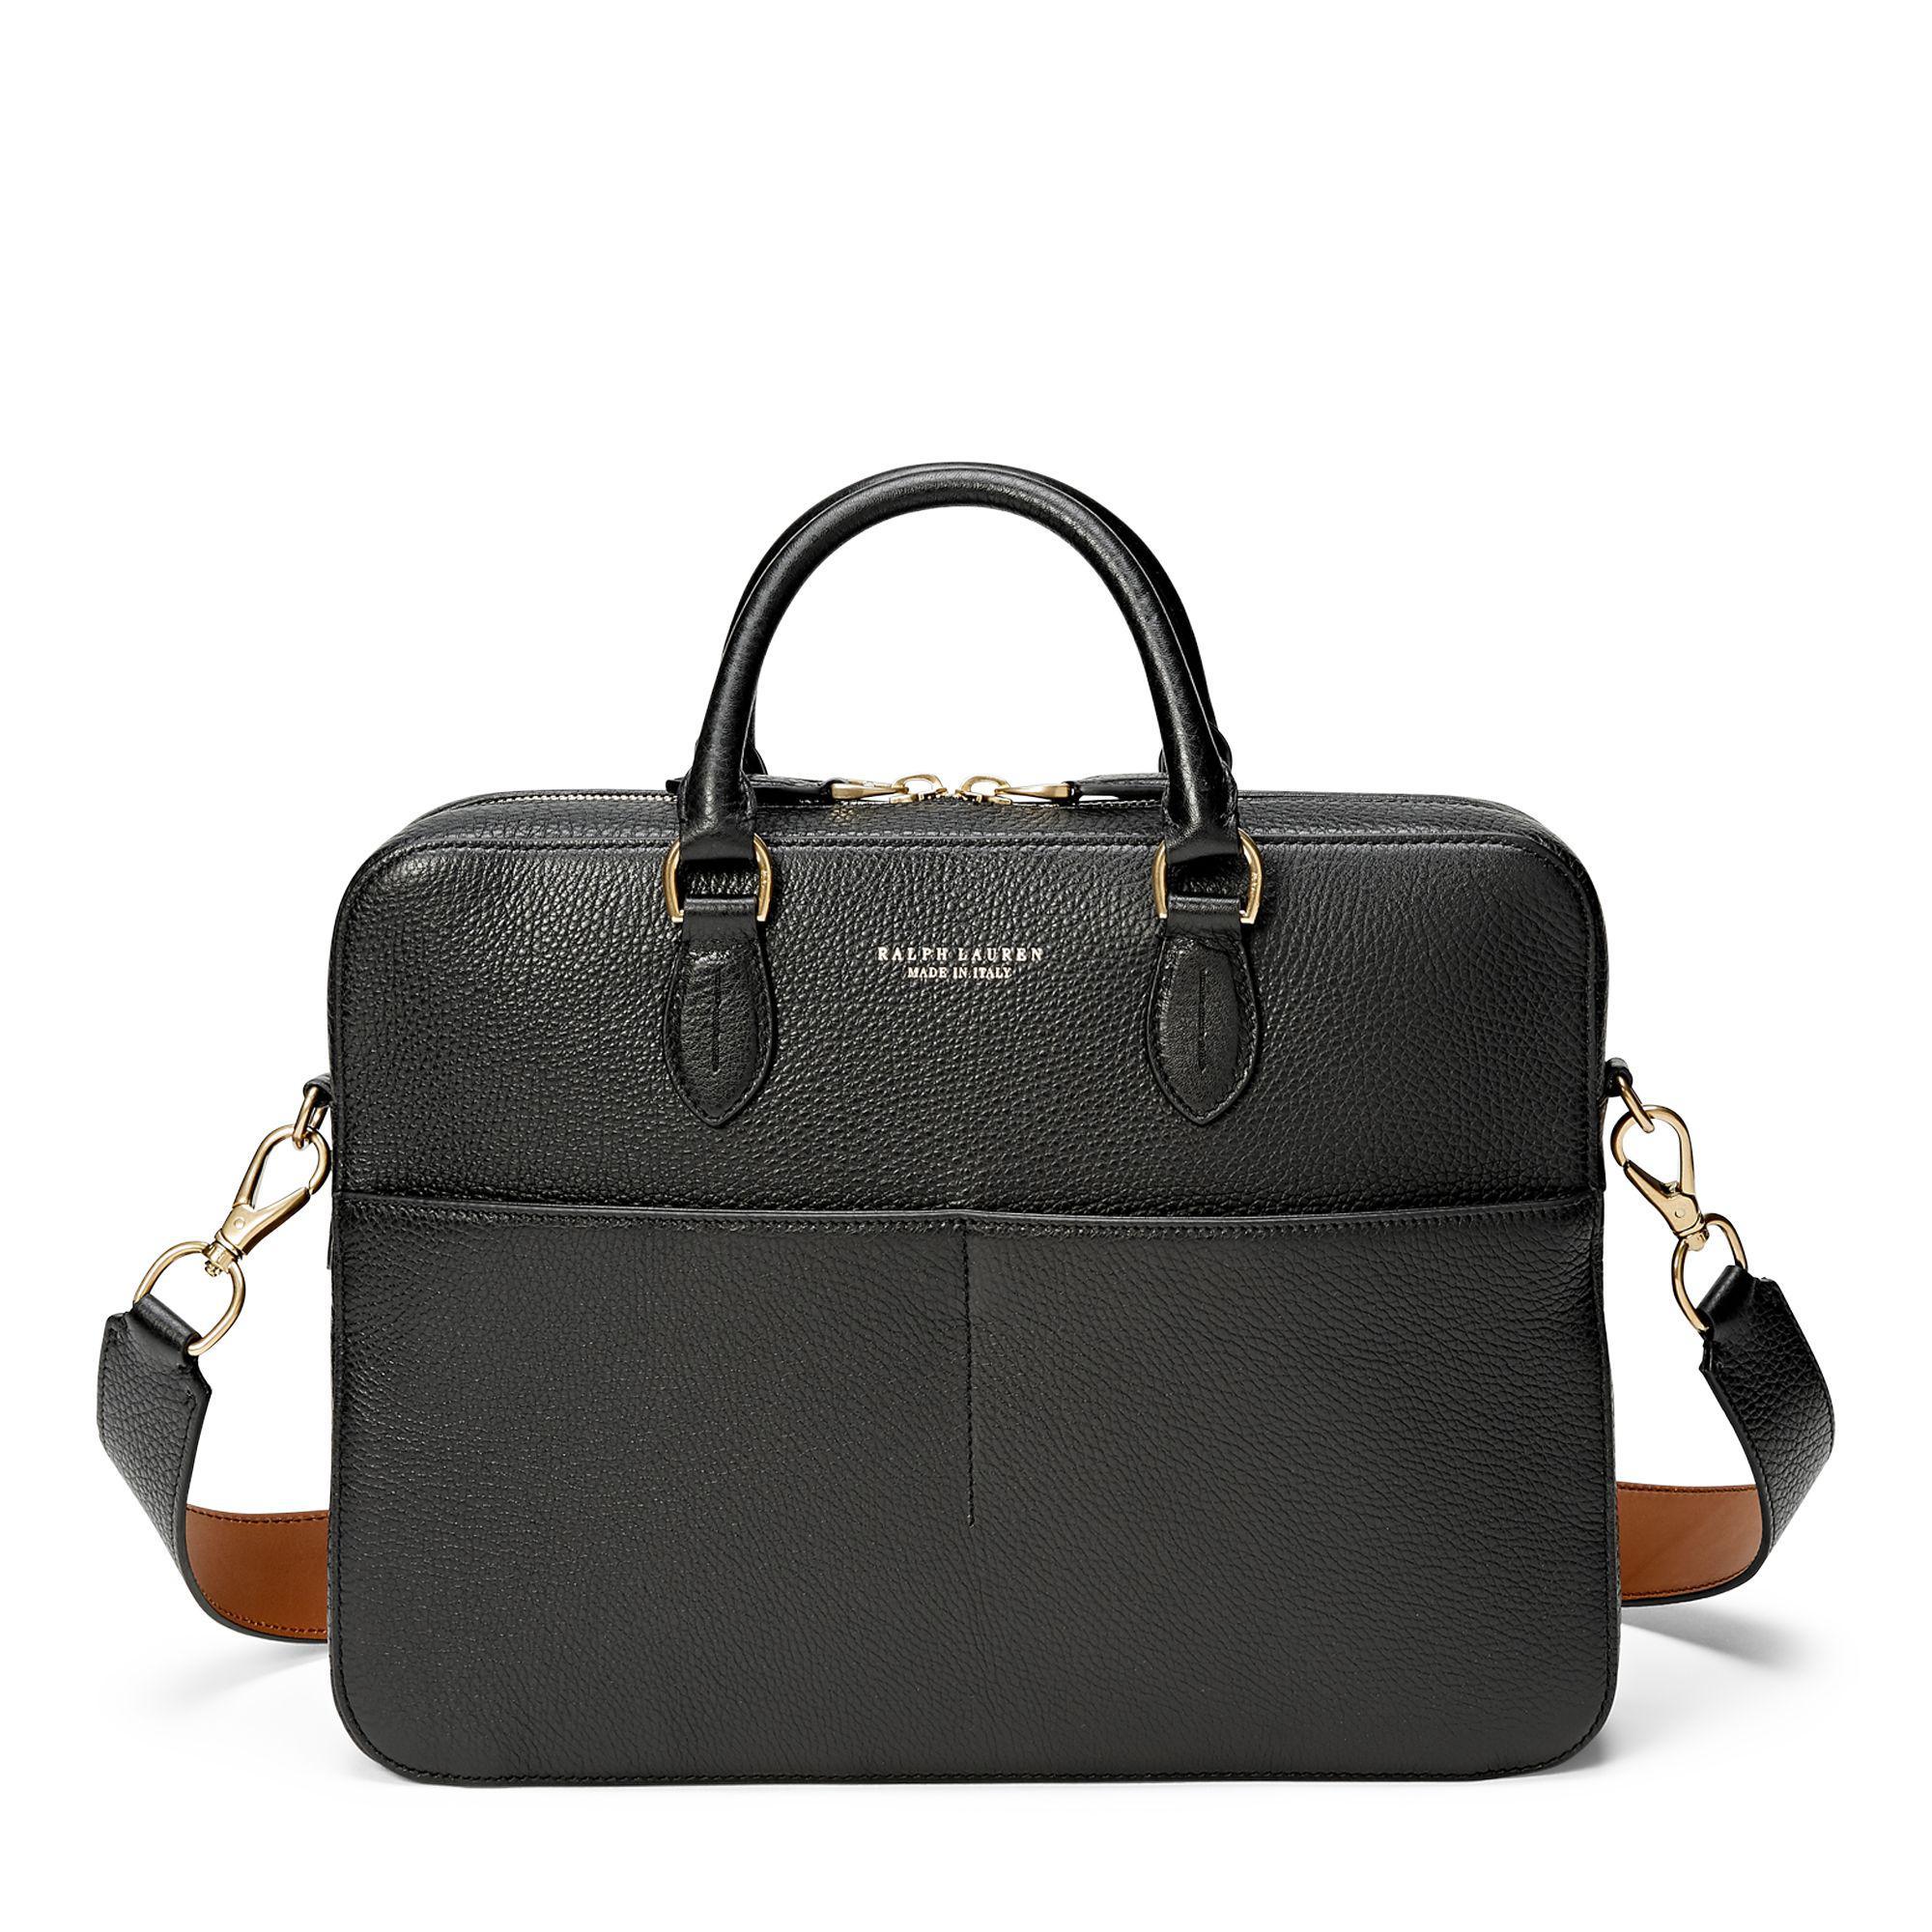 00ef93dfd03 Ralph Lauren Grain Calfskin Briefcase in Black for Men - Lyst